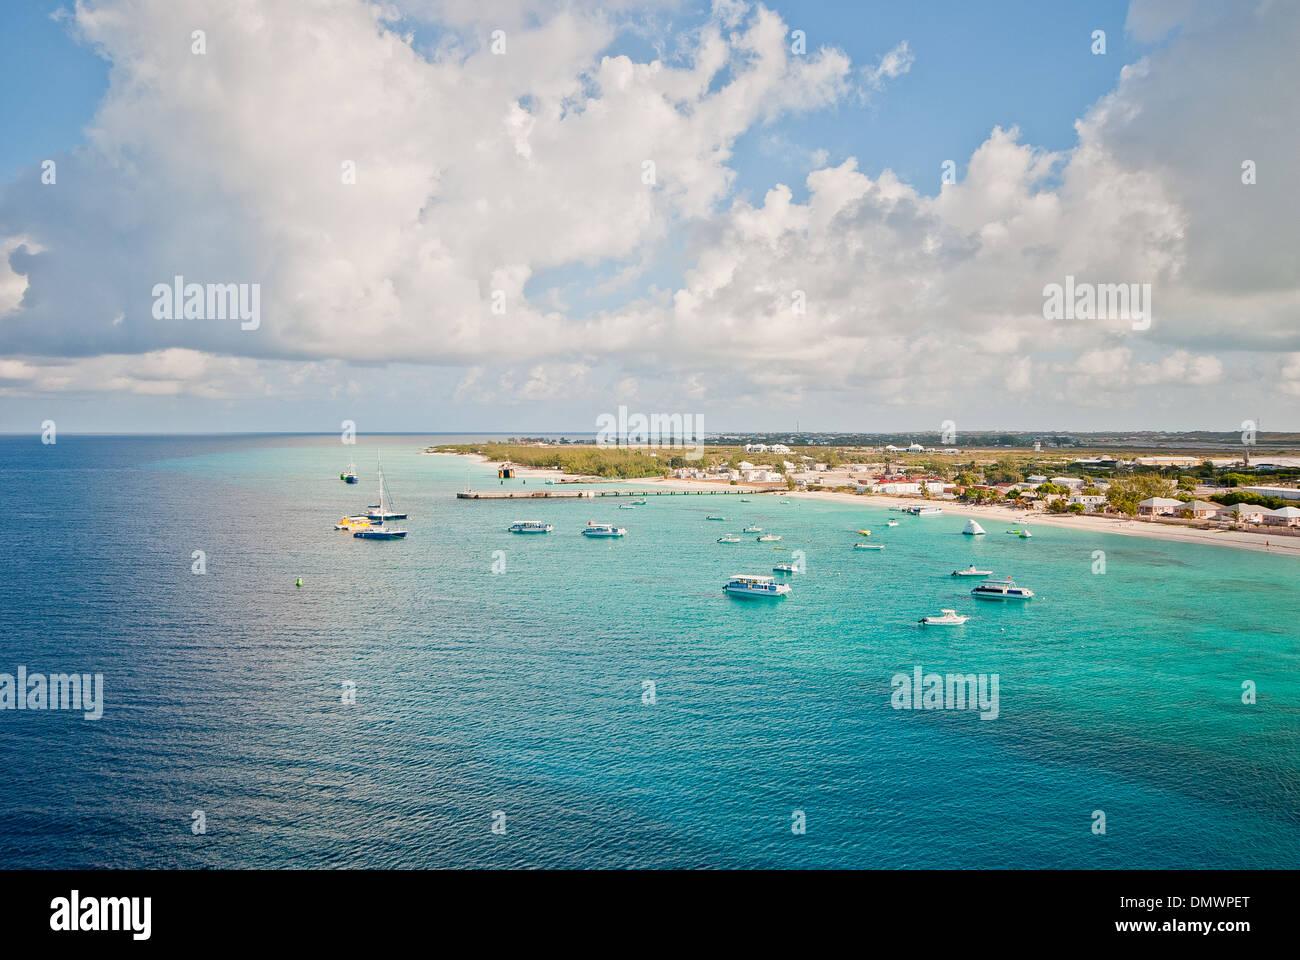 View of the Bahamas island Grand Turk. - Stock Image